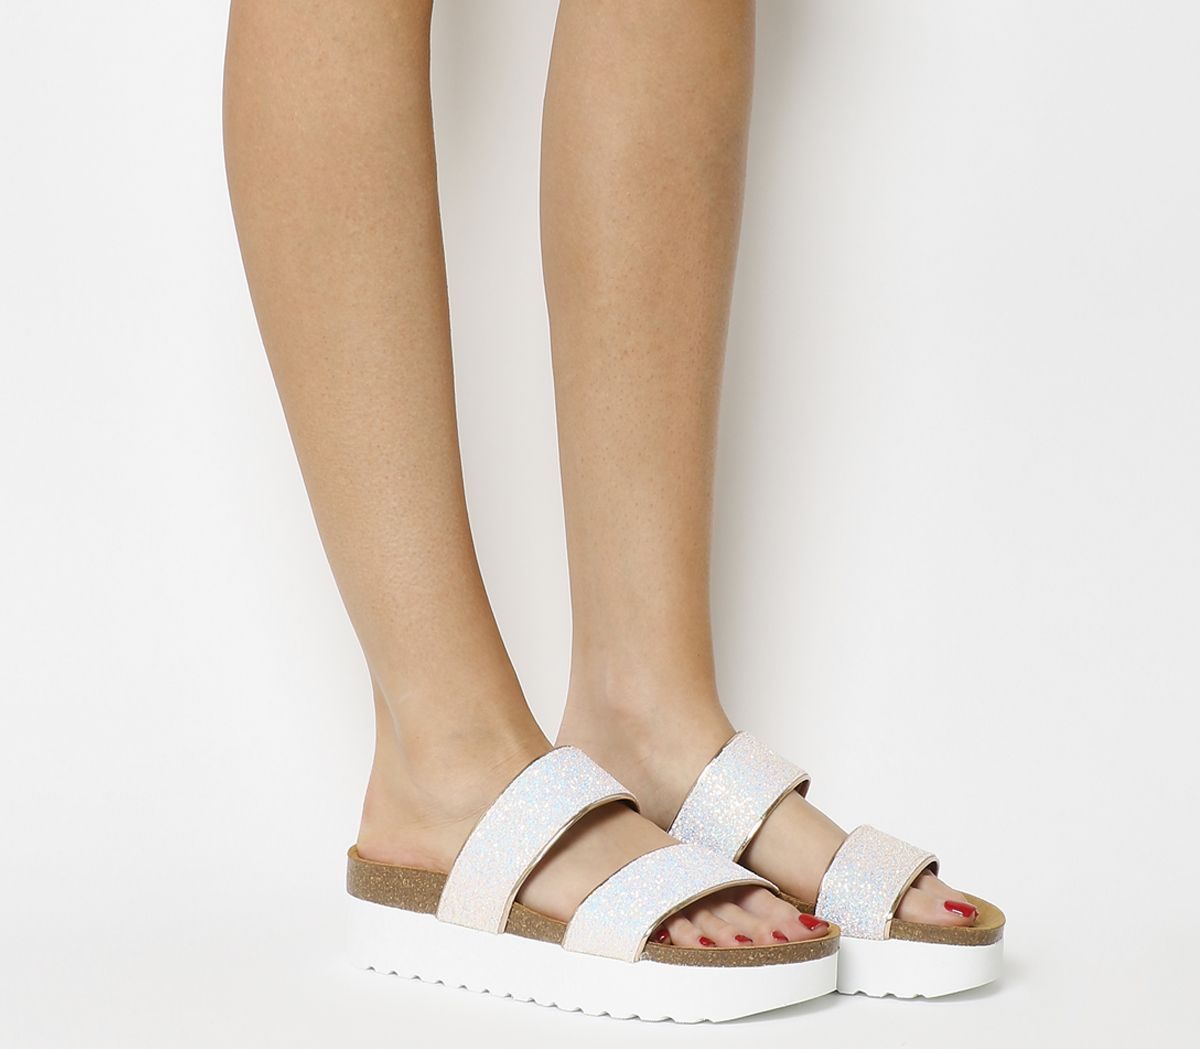 0b741b1547d0 Office Magnetic 2 Footbed Sliders Pink Glitter - Sandals